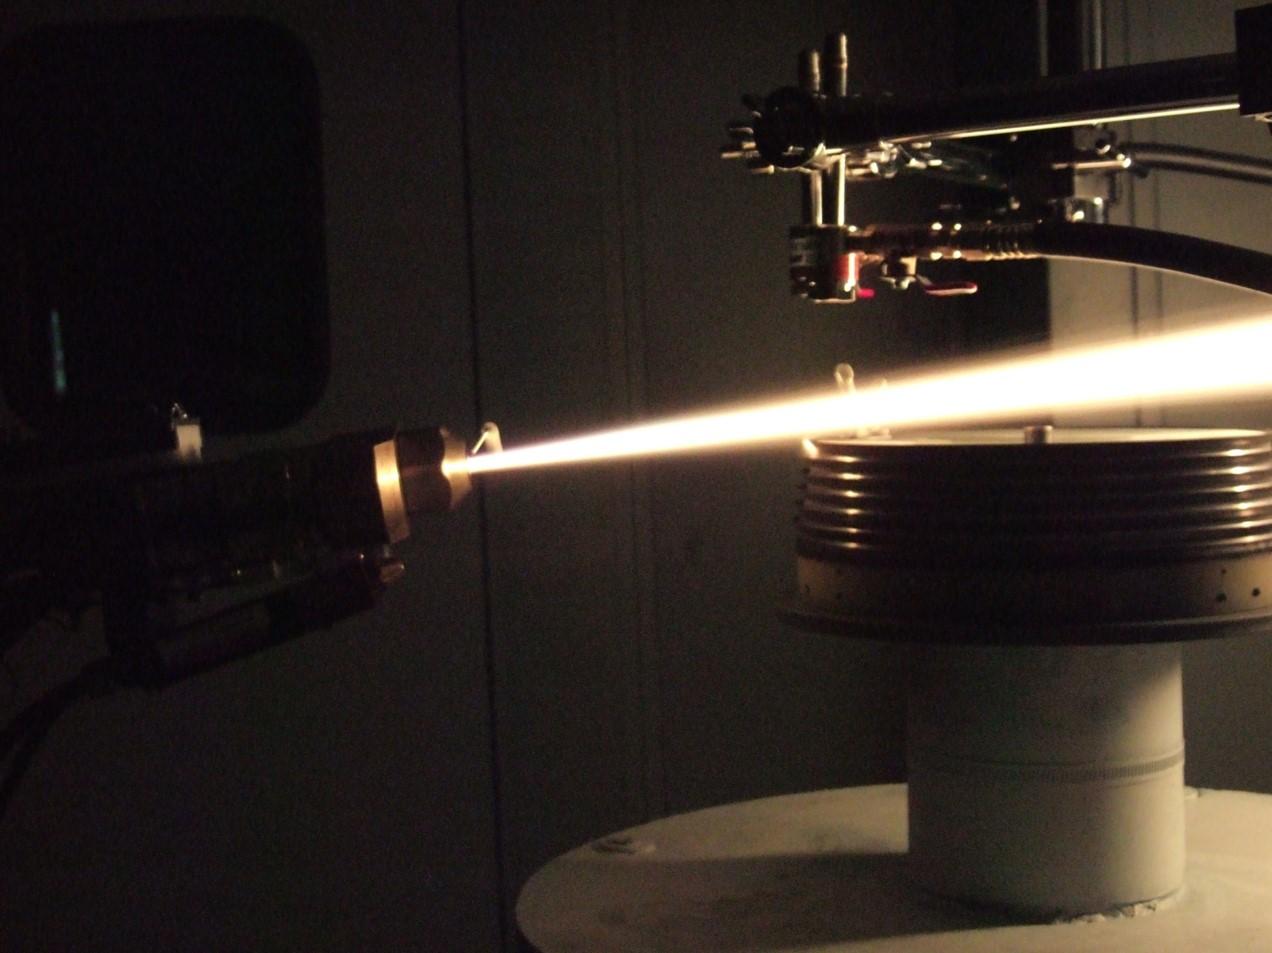 http://aerospaceconsultants.com/wp-content/uploads/2014/11/thermal-spray.jpg